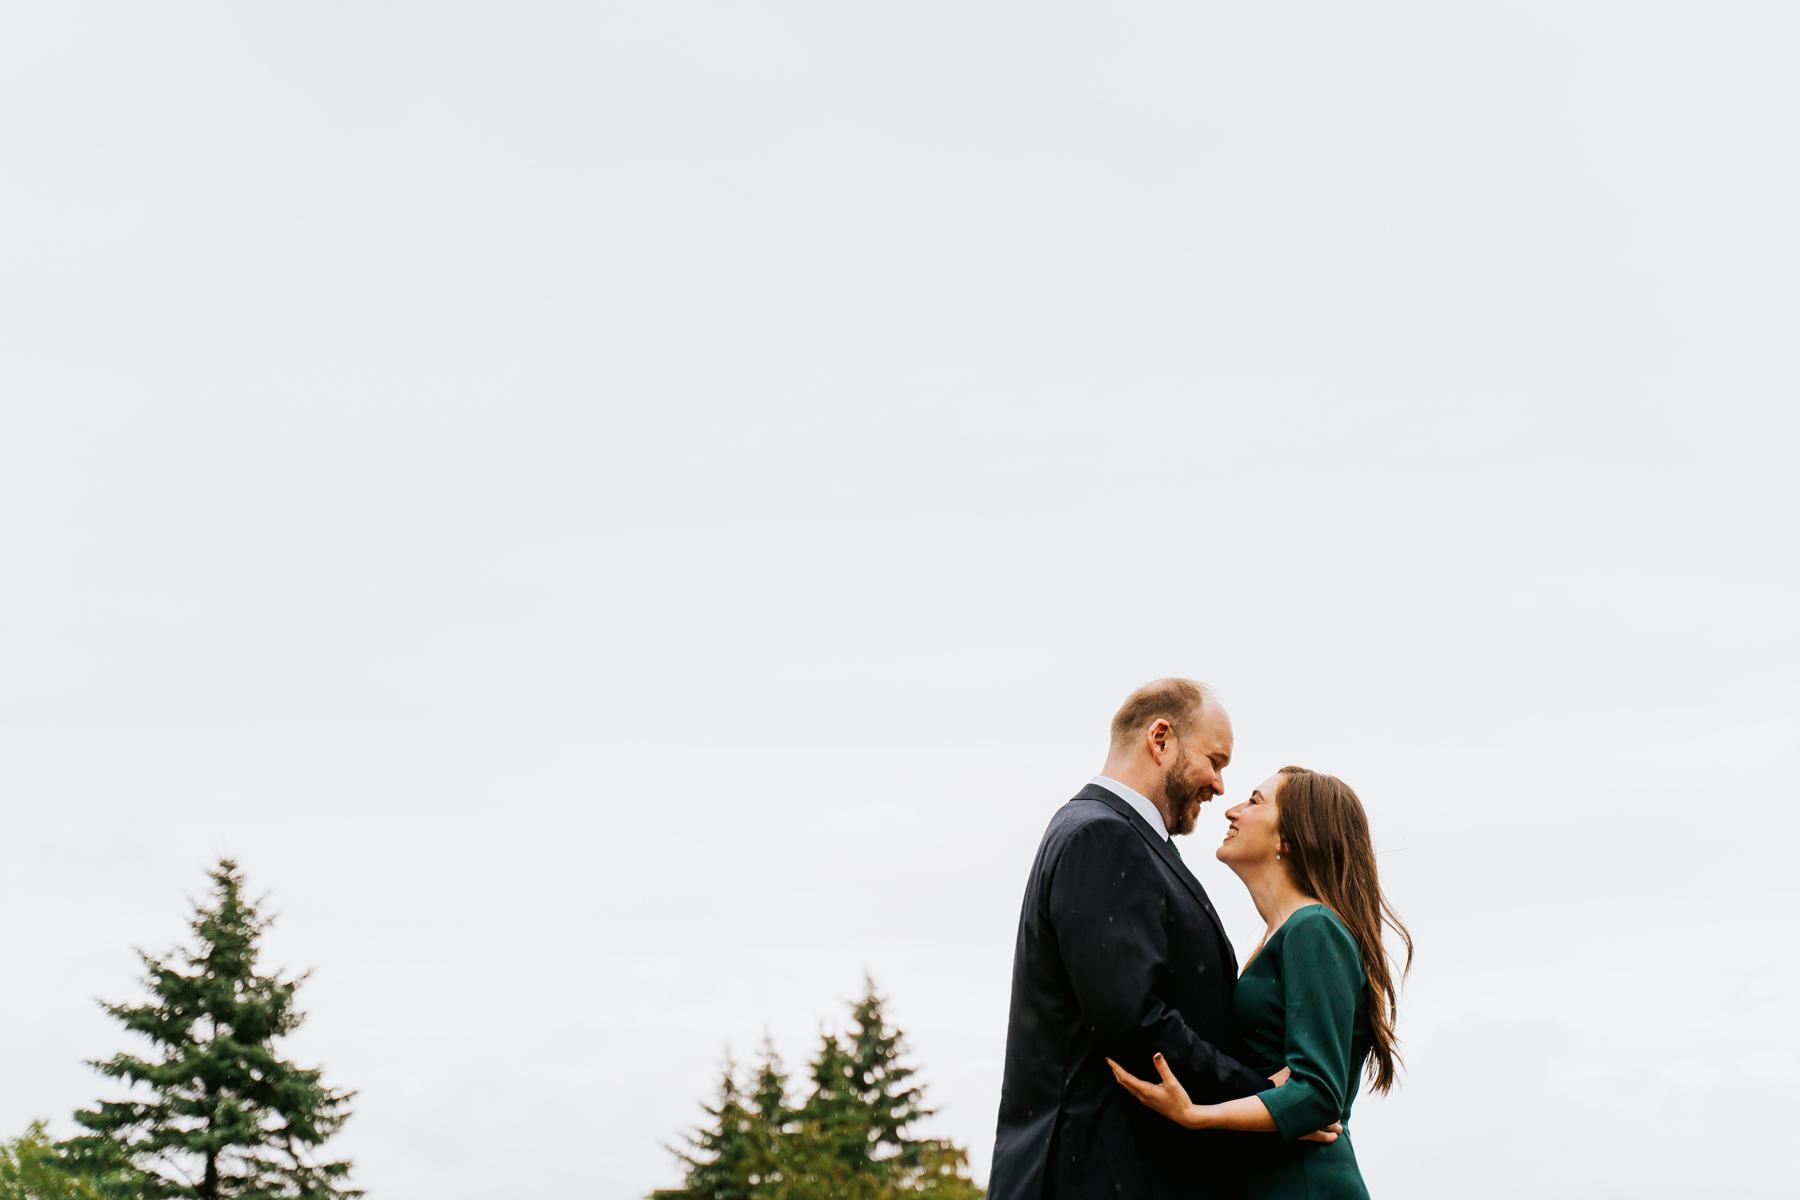 012-fredericton-wedding-kandise-brown-dm2020